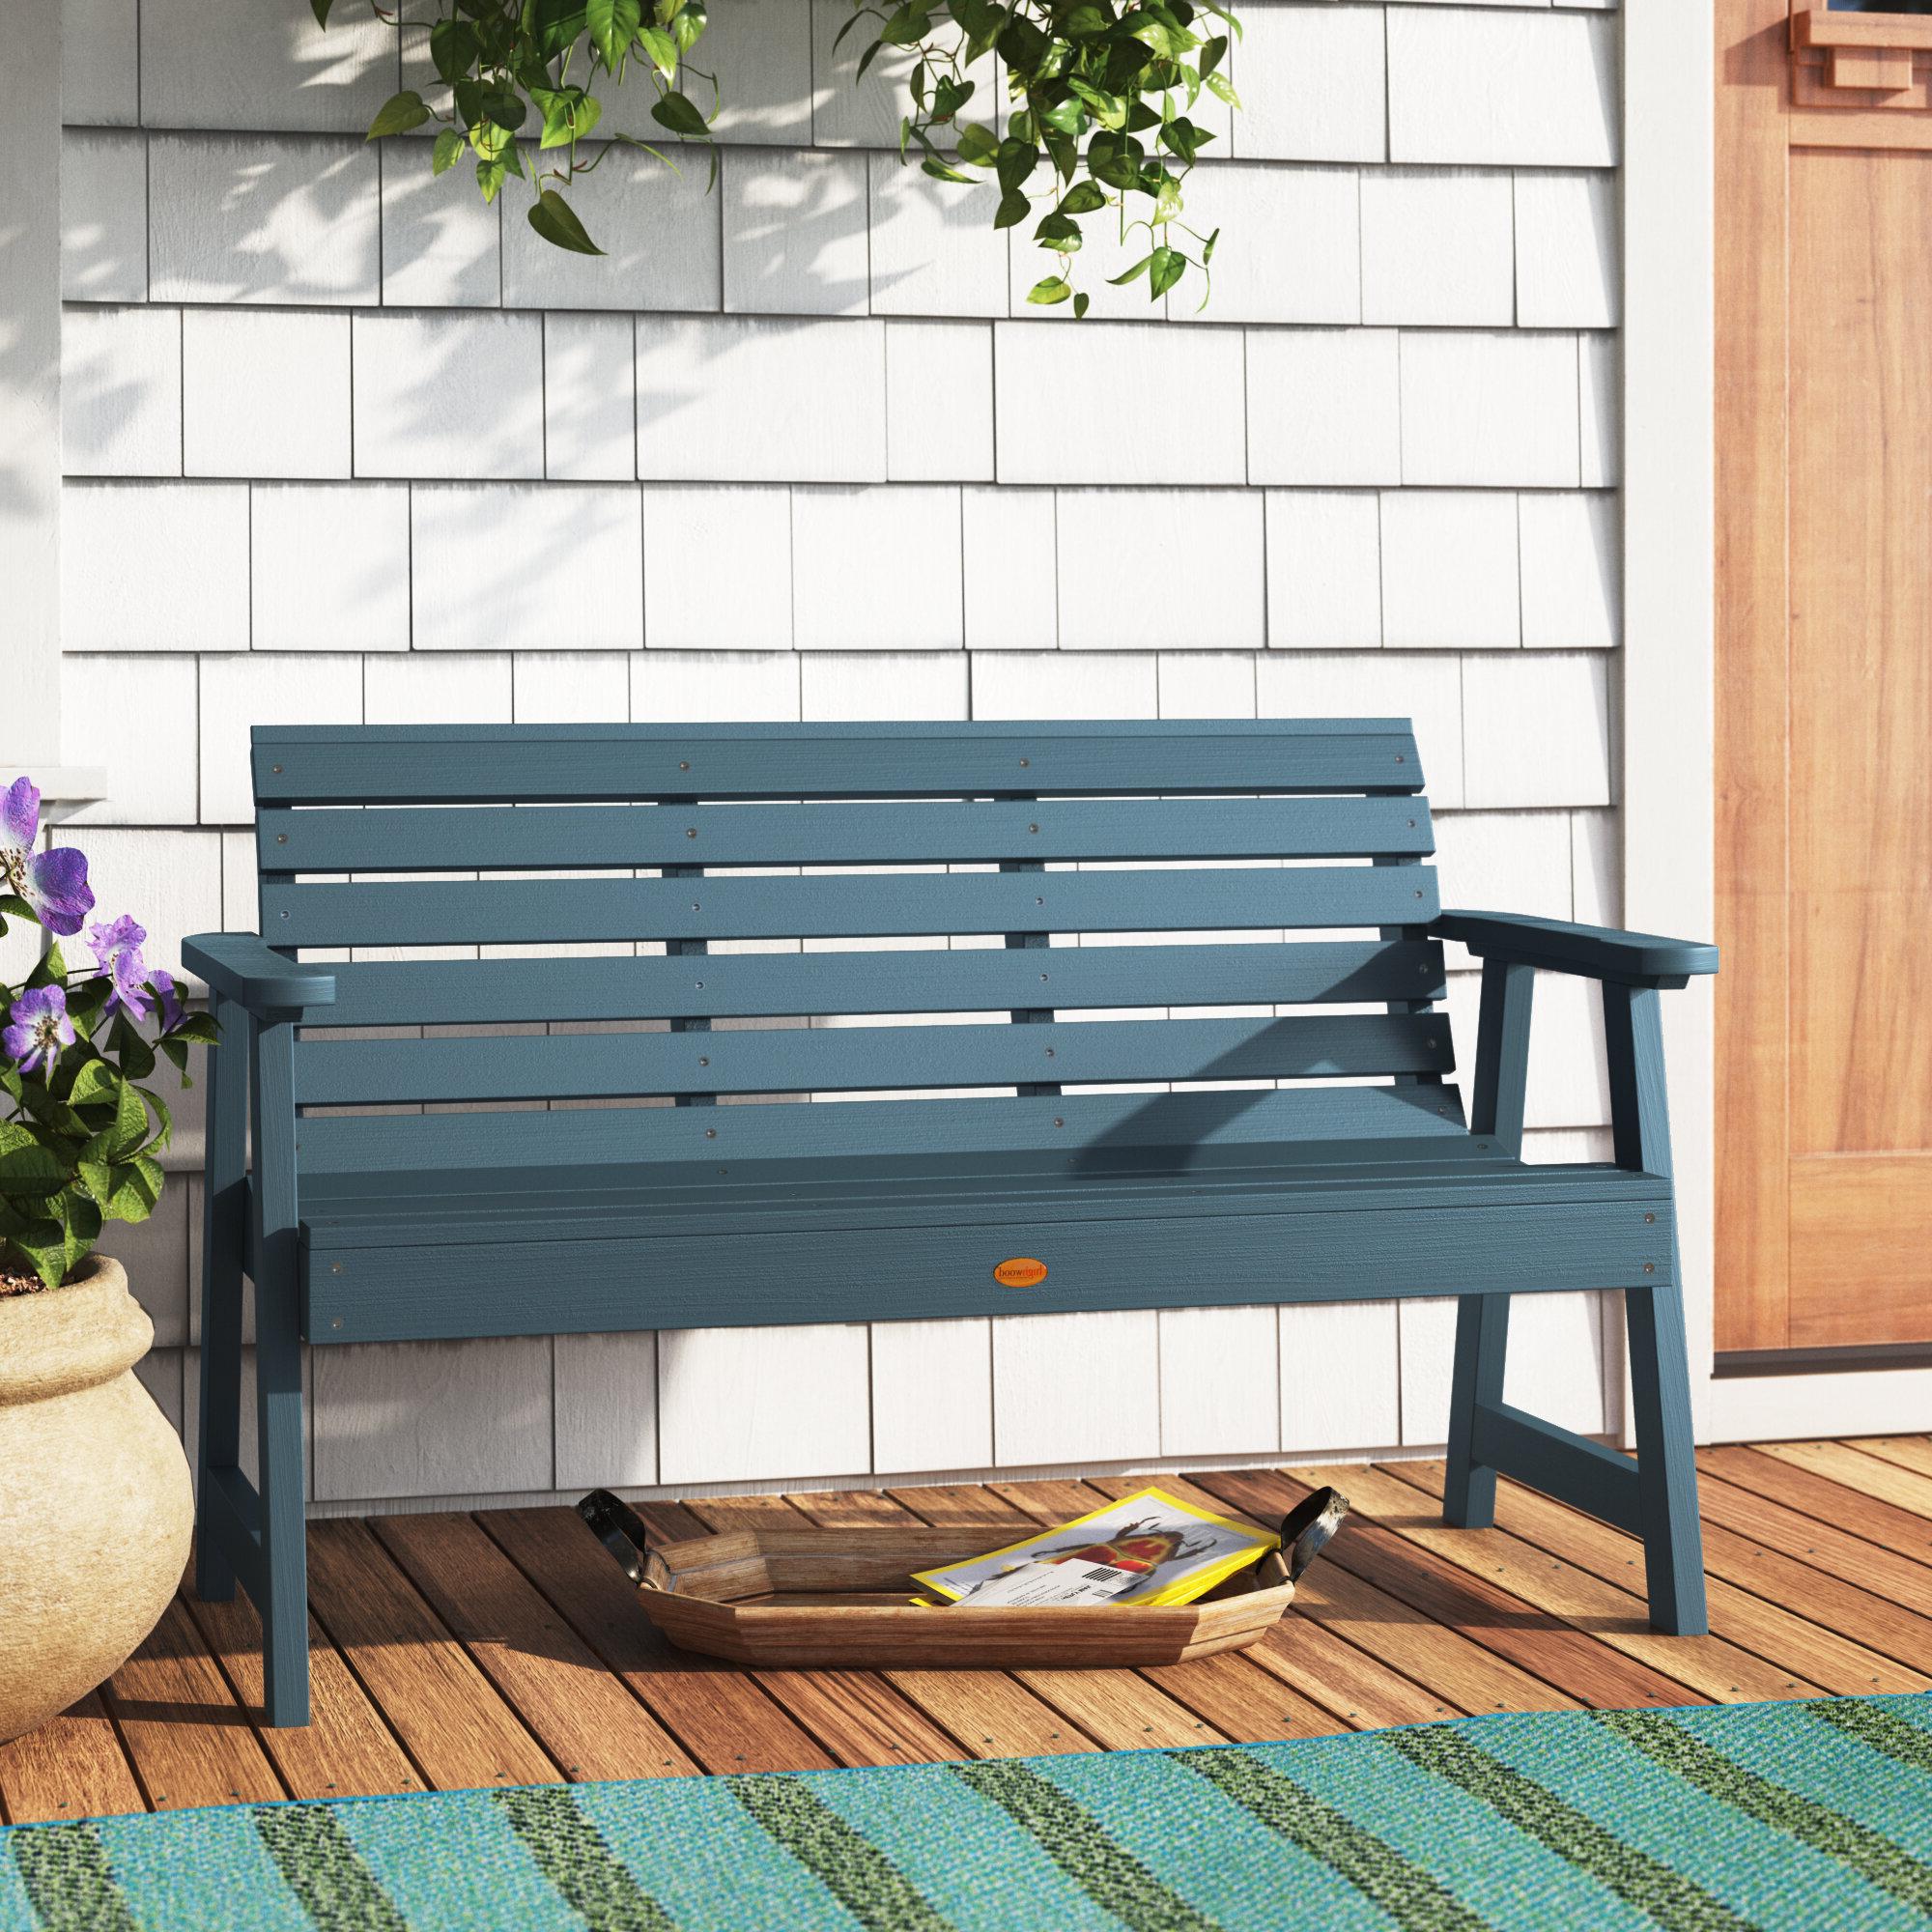 Wayfair Pertaining To Krystal Ergonomic Metal Garden Benches (View 6 of 30)